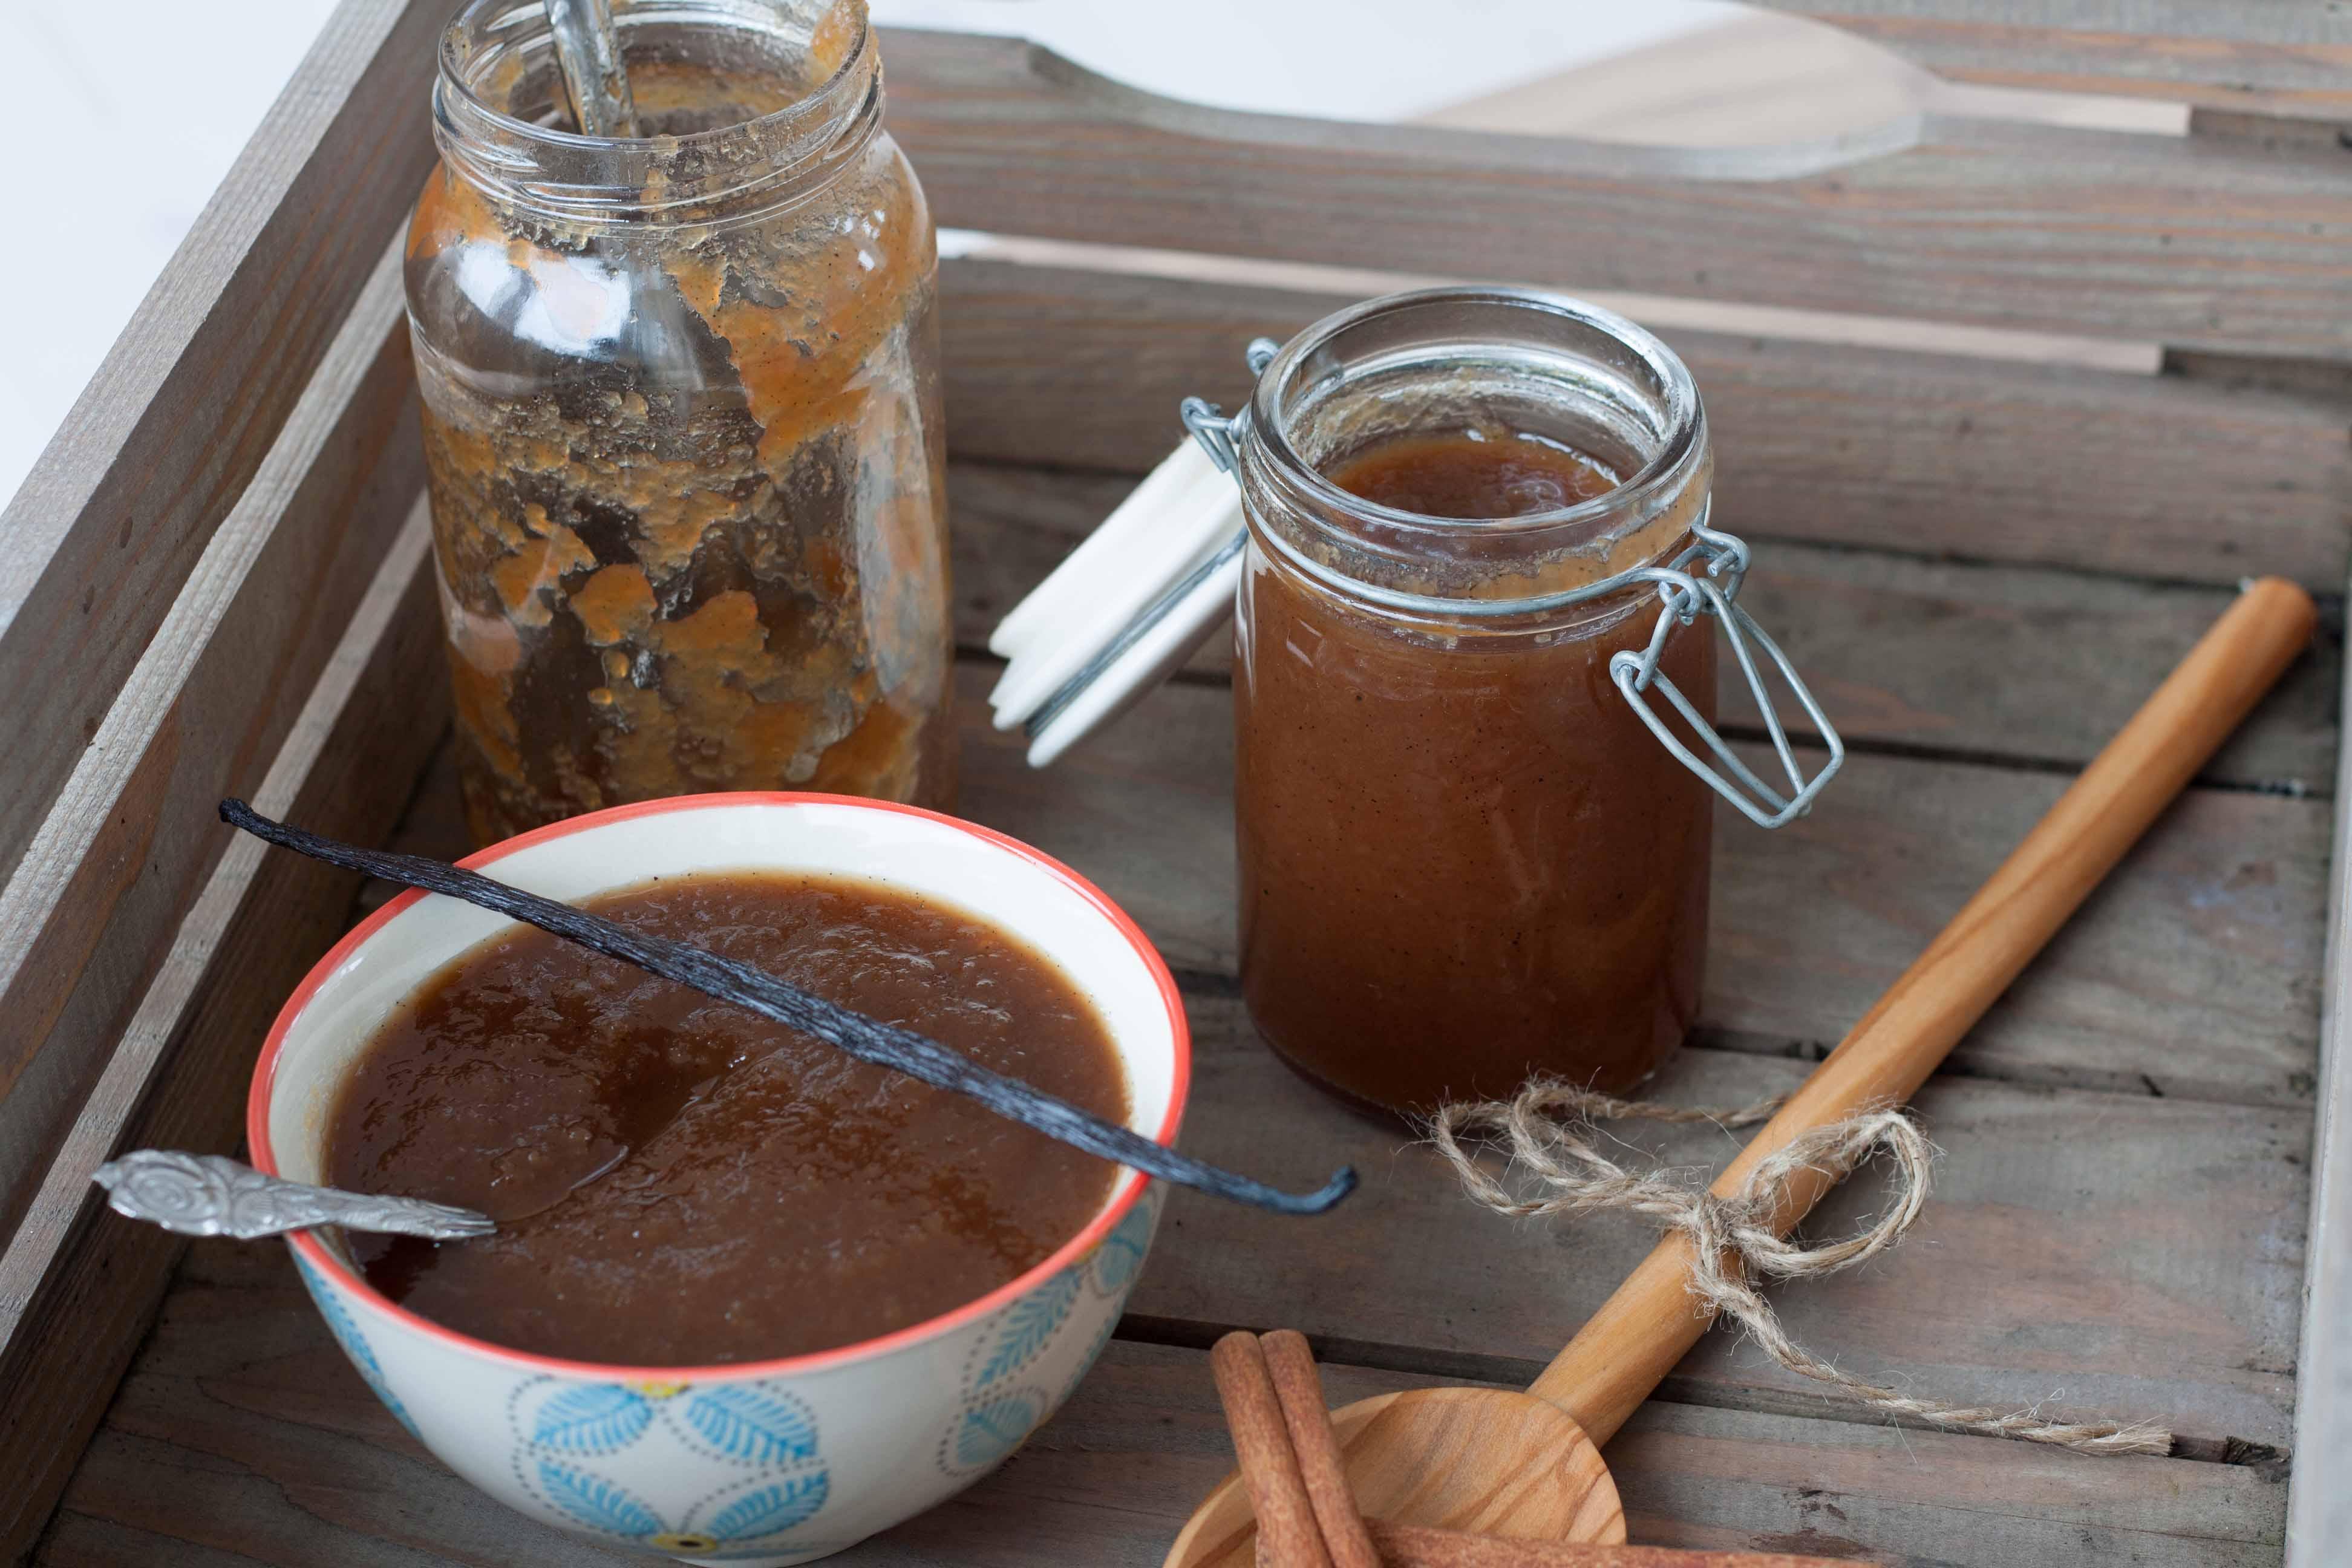 Opskrift på hjemmelavet Æblesmør med vanilje & kanel, apple butter